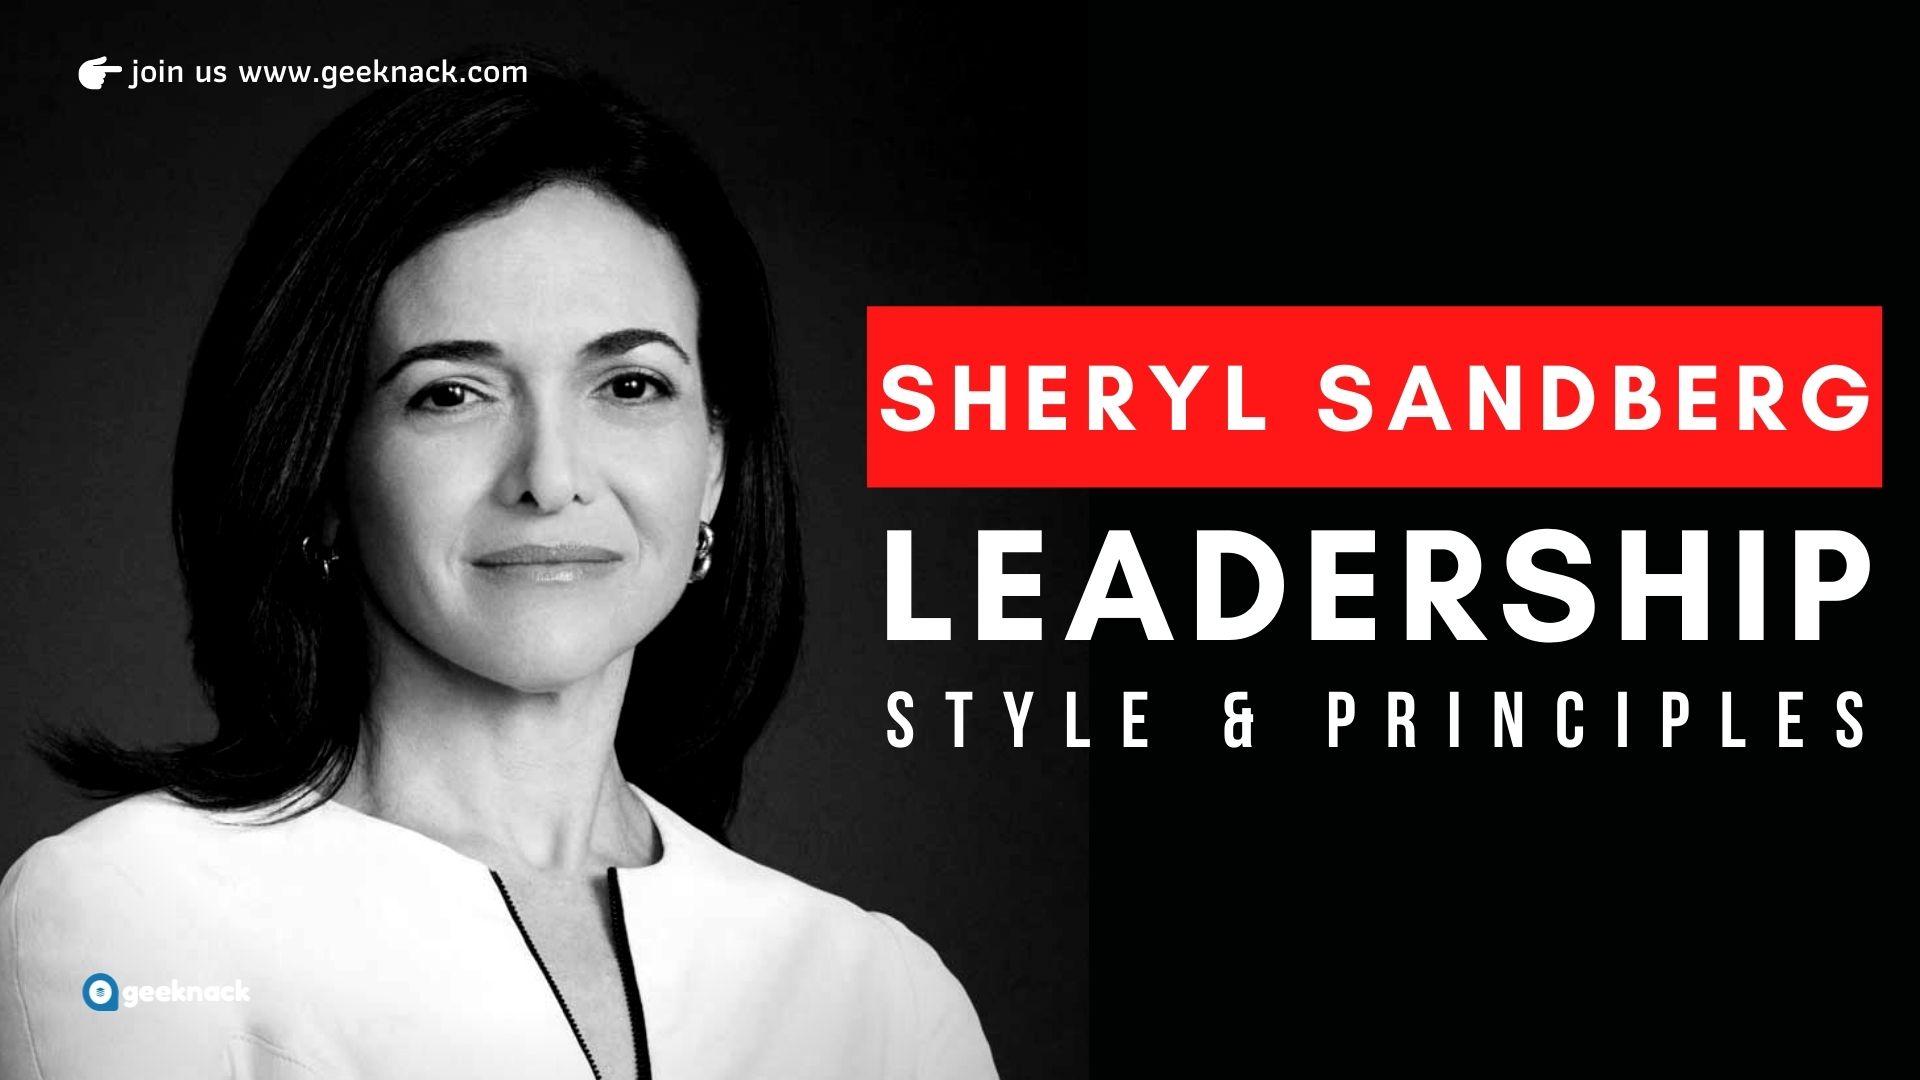 Sheryl Sandberg Leadership Style & Principles cover